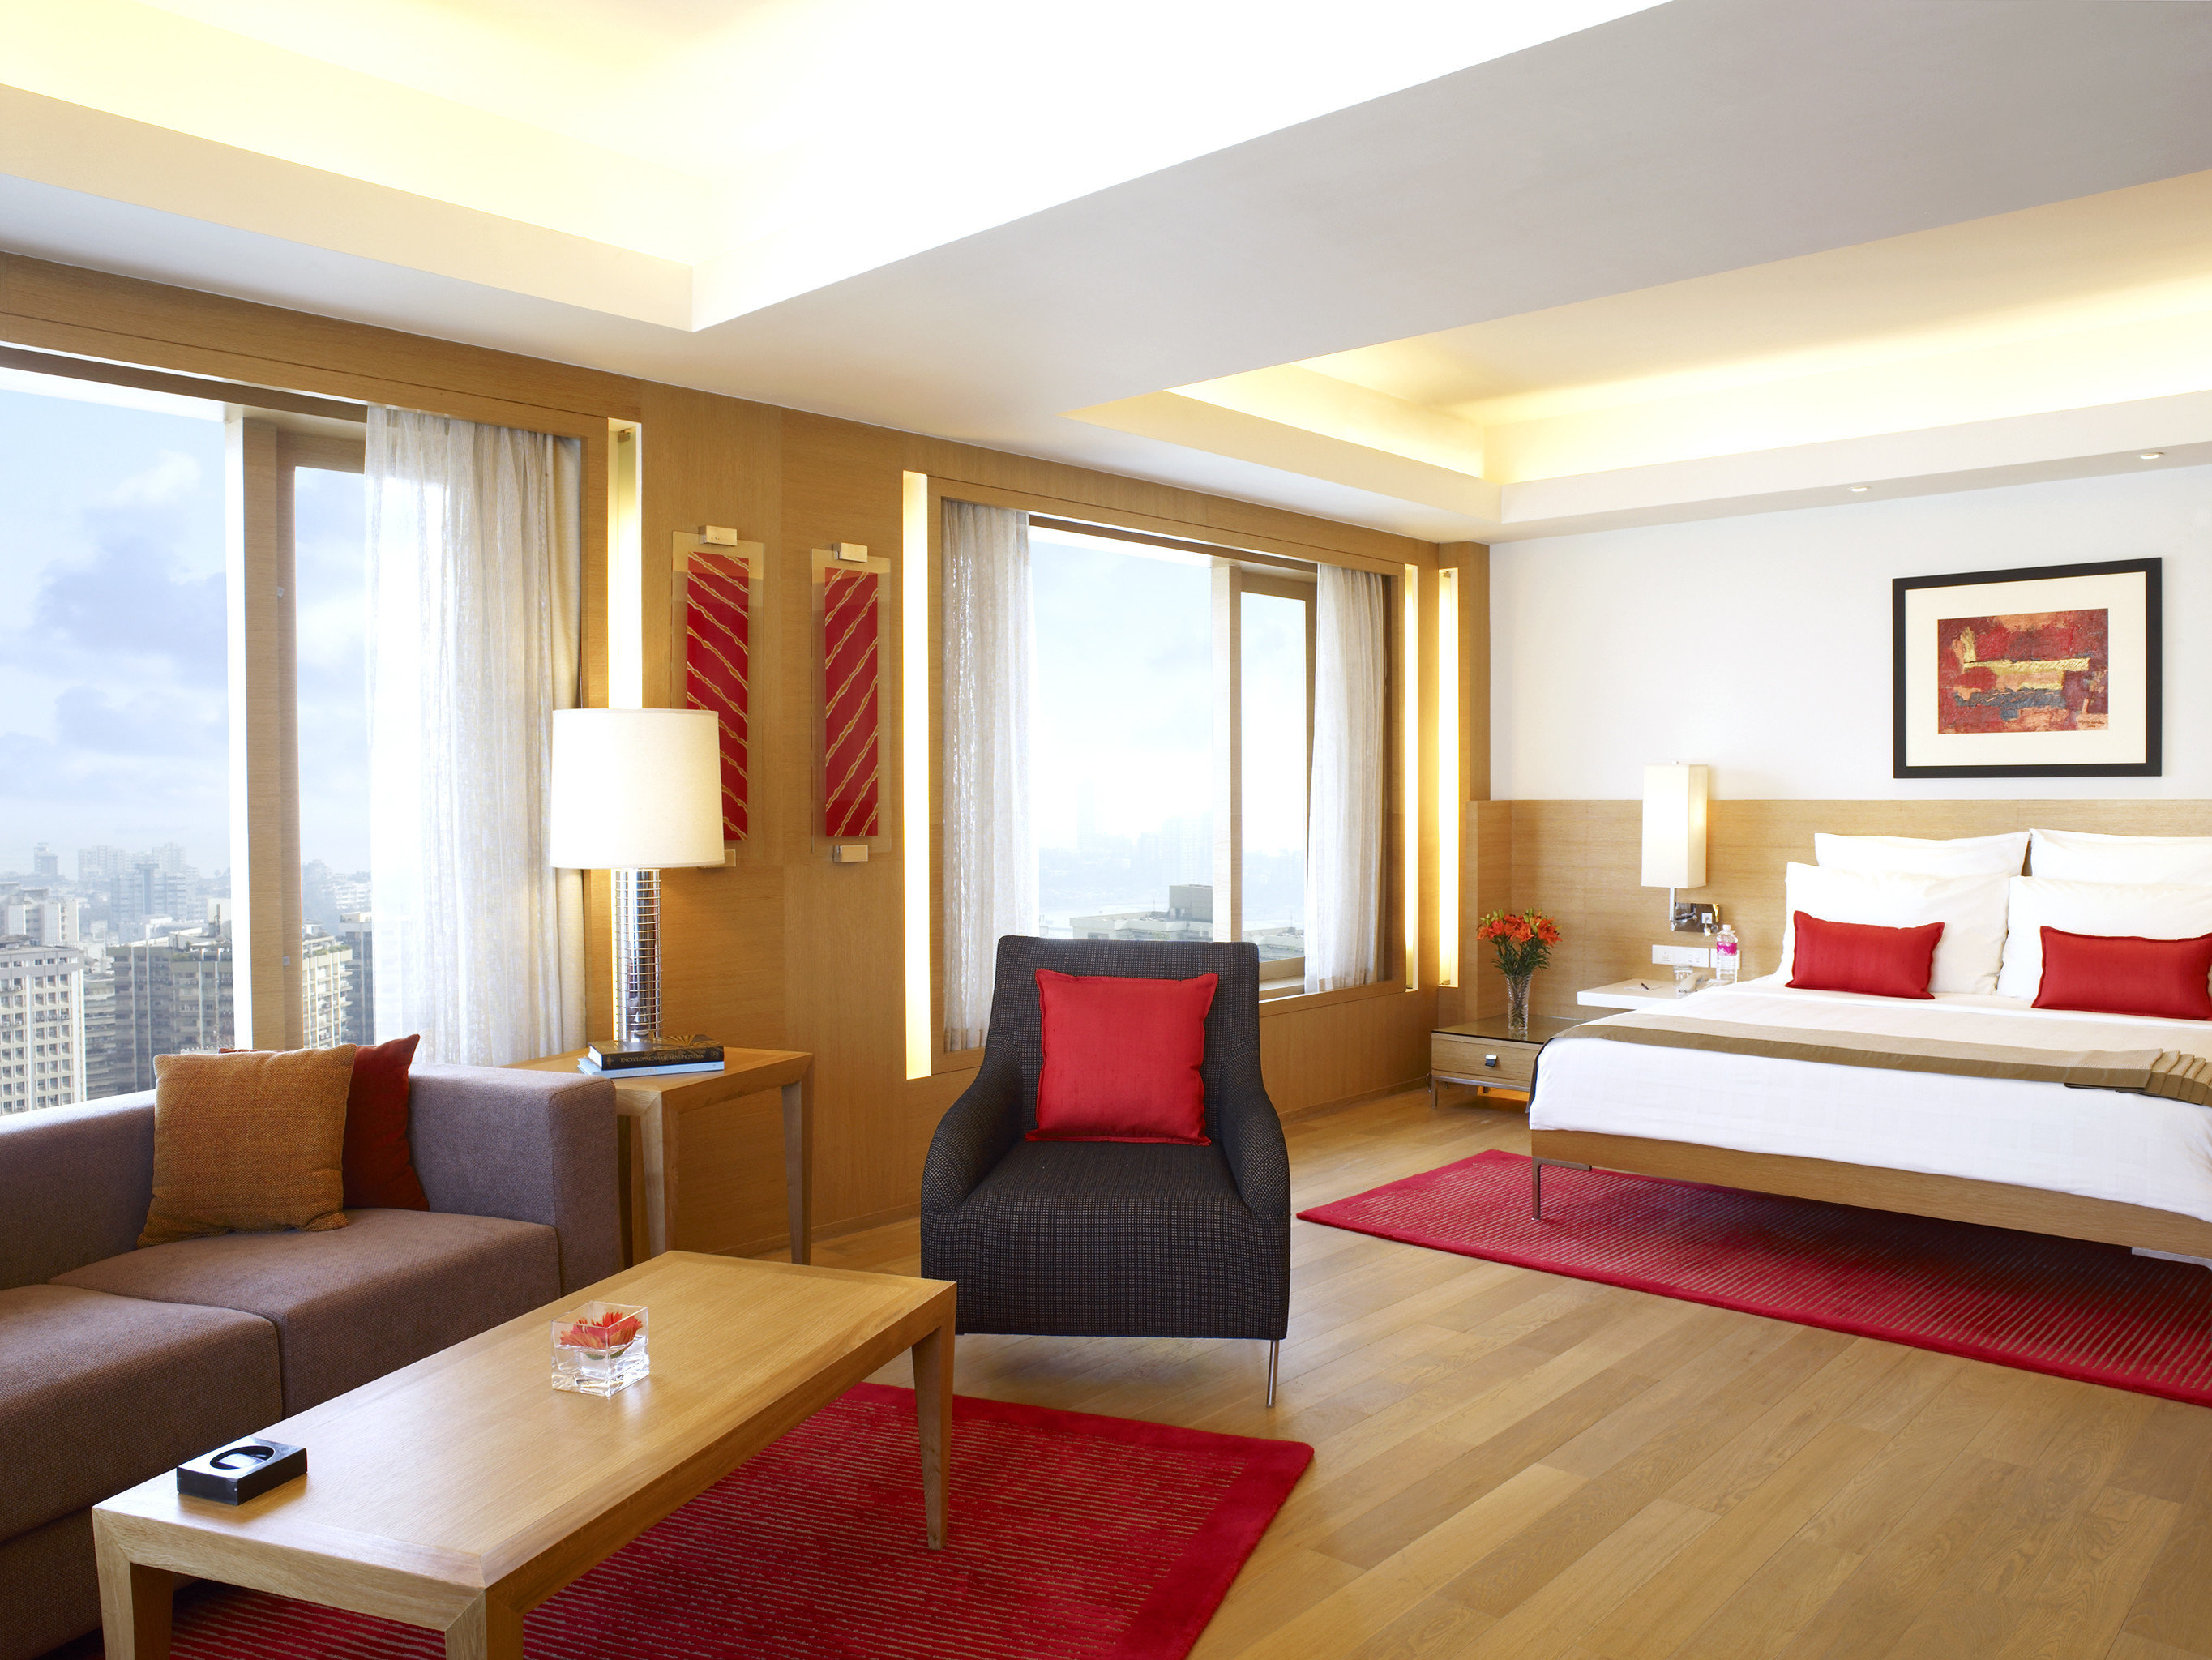 Bedroom City Modern Scenic views Waterfront property Suite red living room condominium Resort Villa flat clean